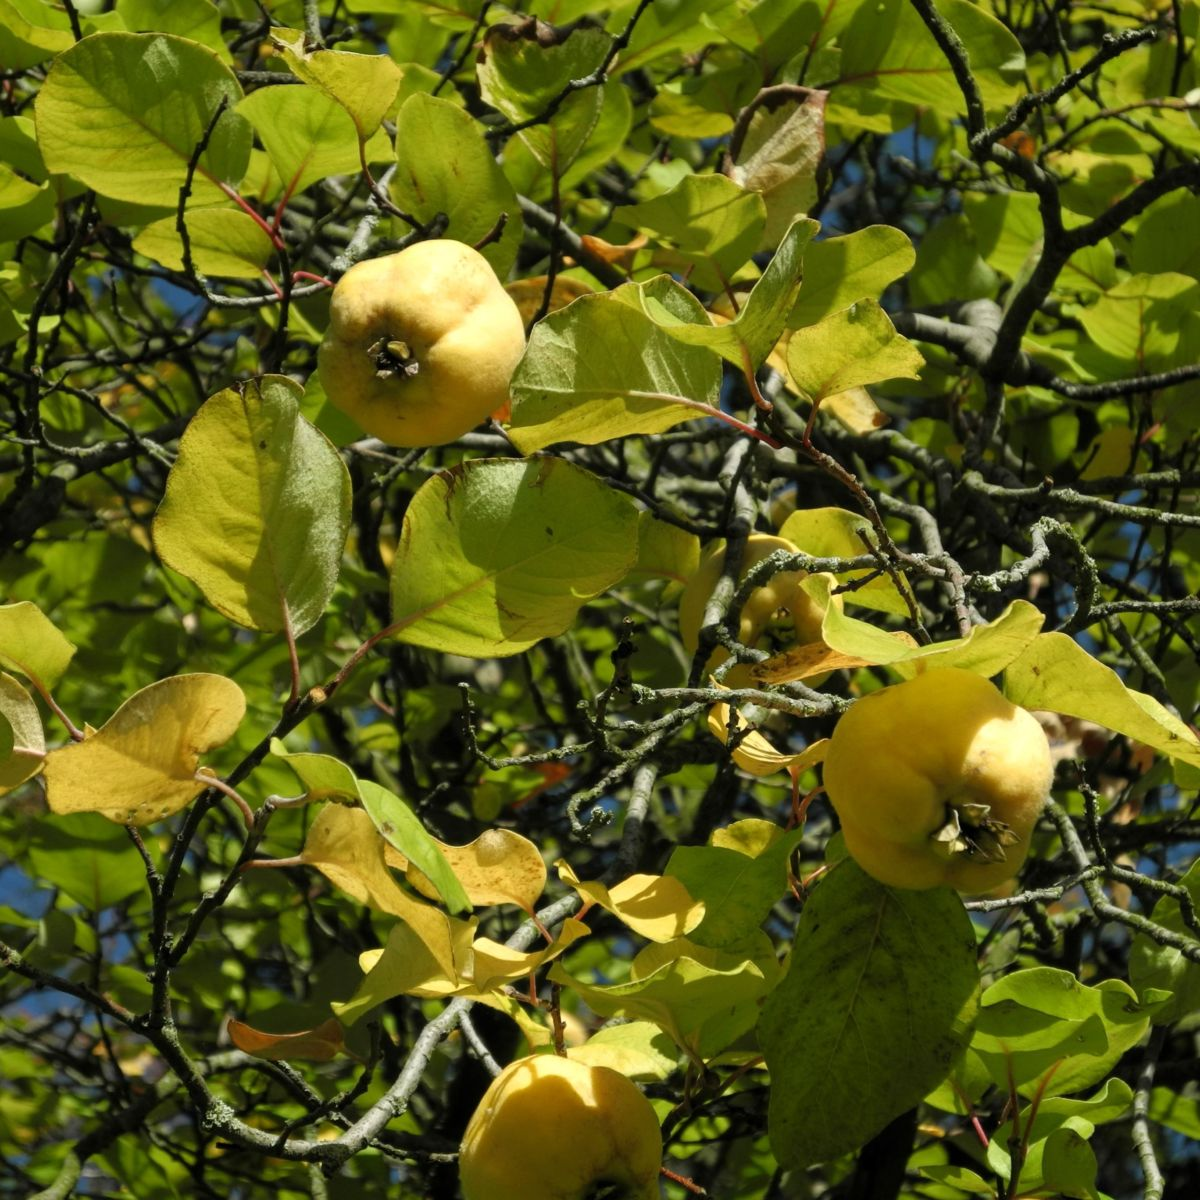 Quitte Frucht gelb Cydonia oblonga